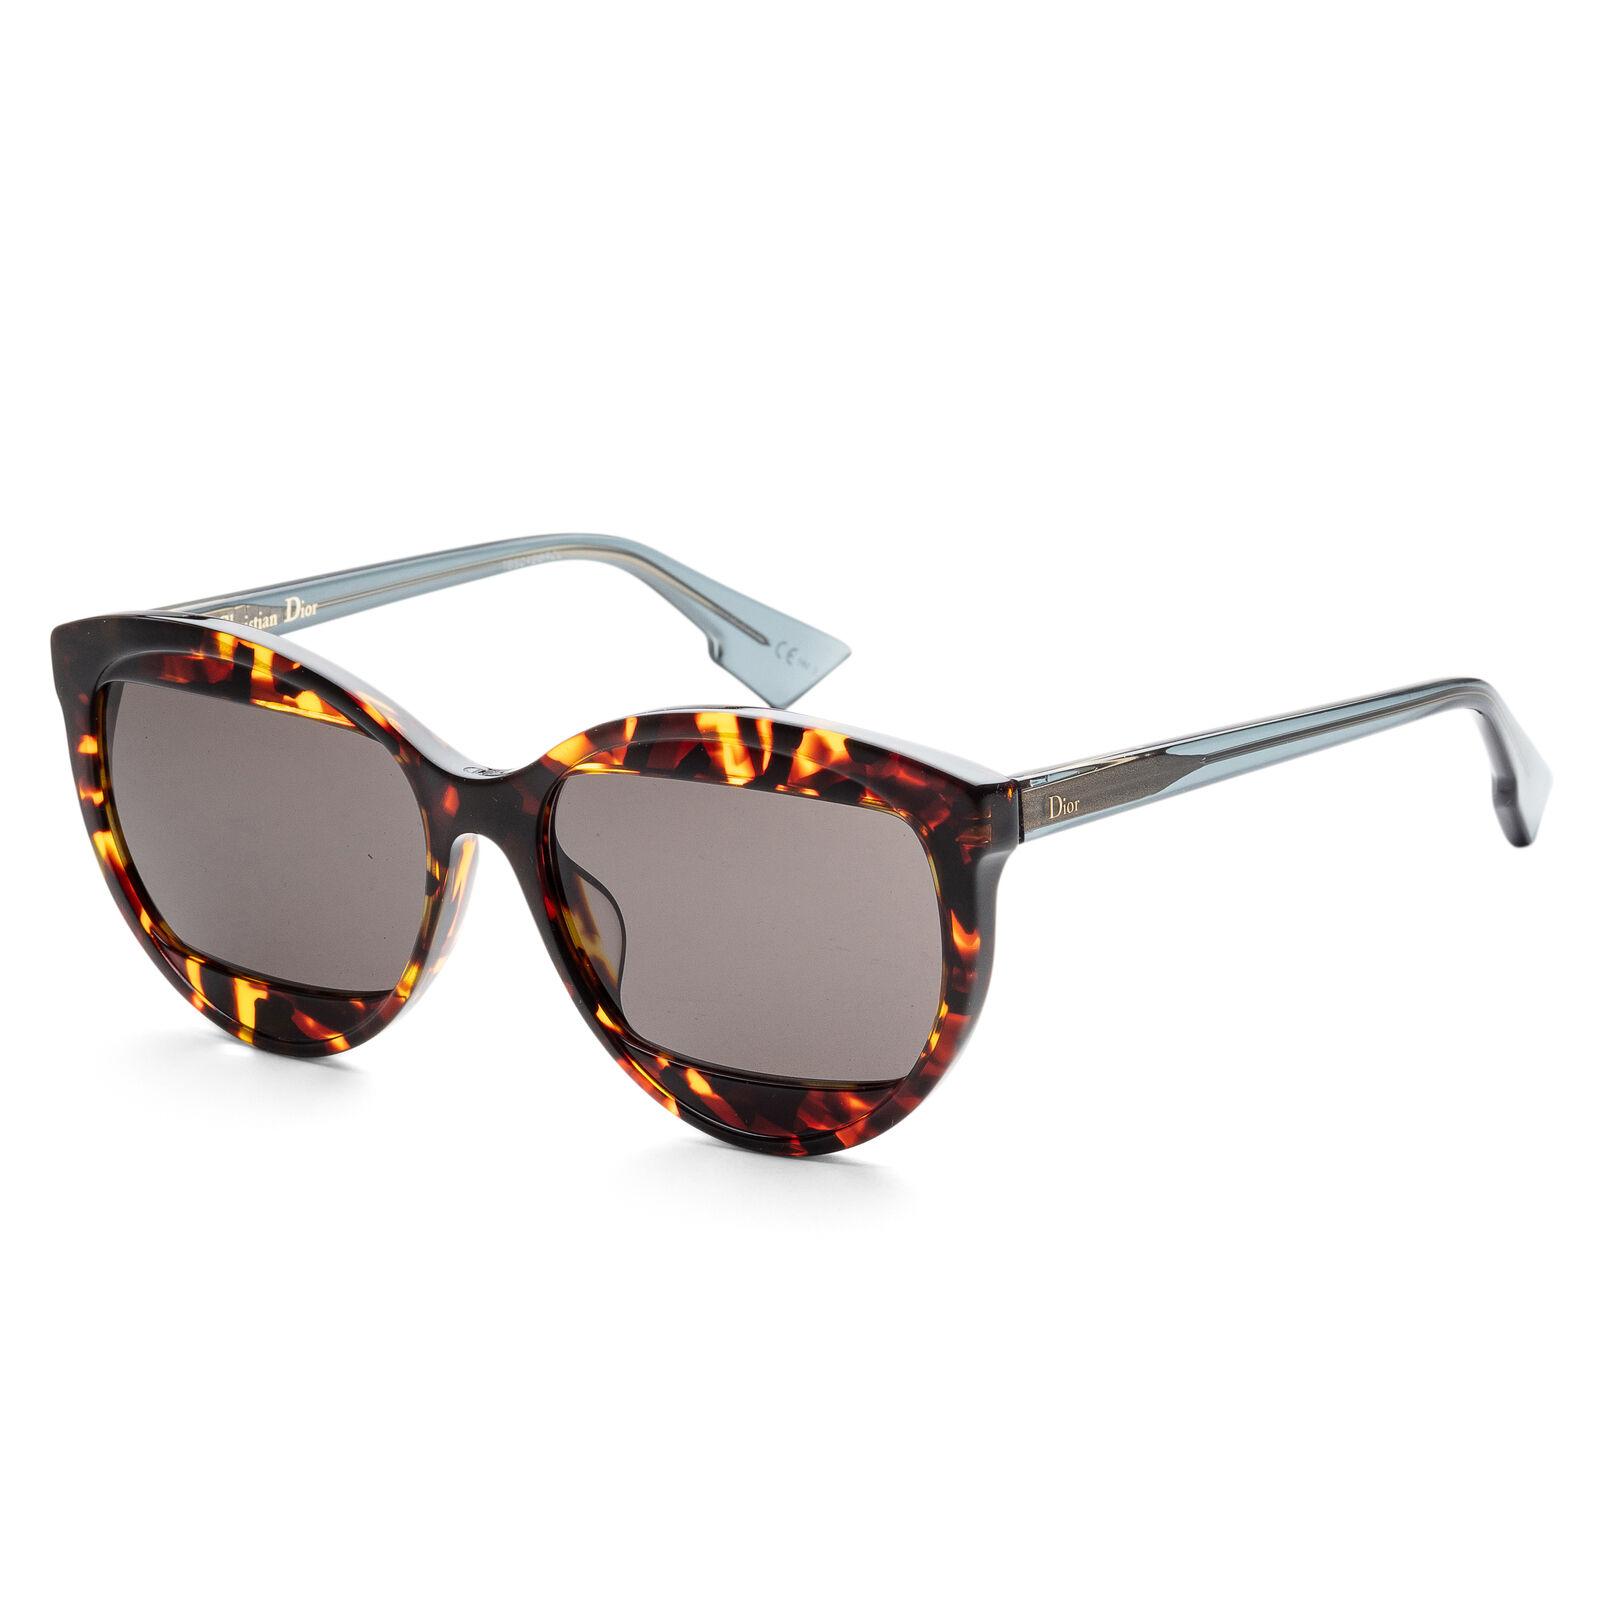 Christian Dior Women's MANIA2S-0TV9-IR 57mm Light Havana Frame Sunglasses